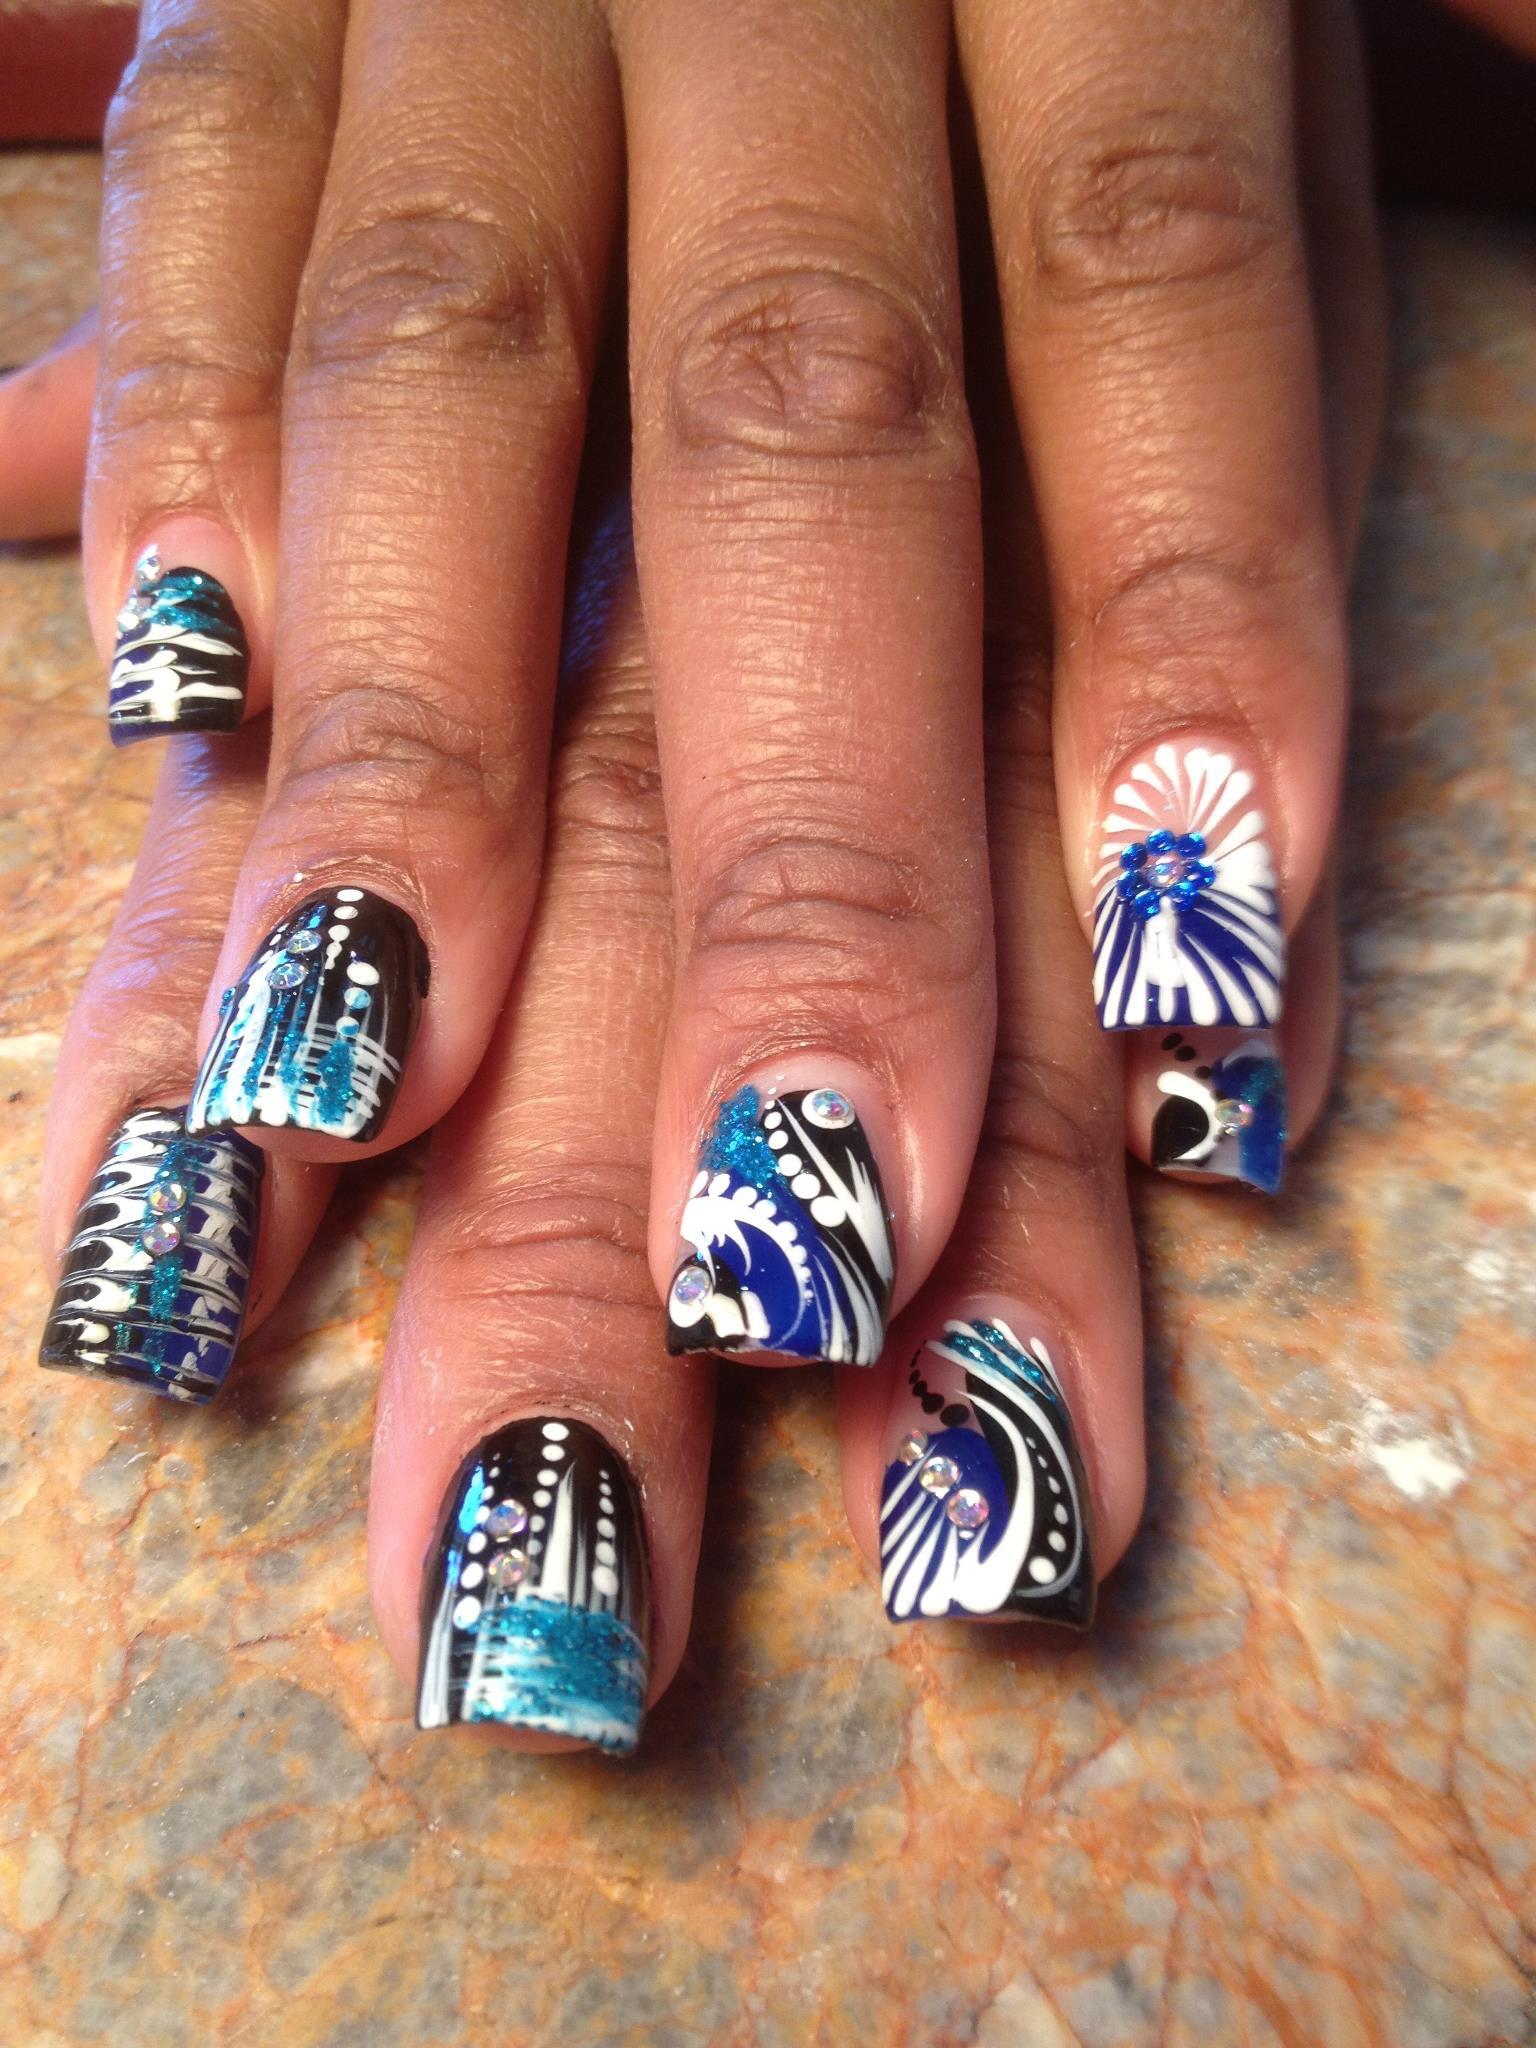 TJ Nails 341 W Northfield Dr, Brownsburg, IN 46112 - YP.com